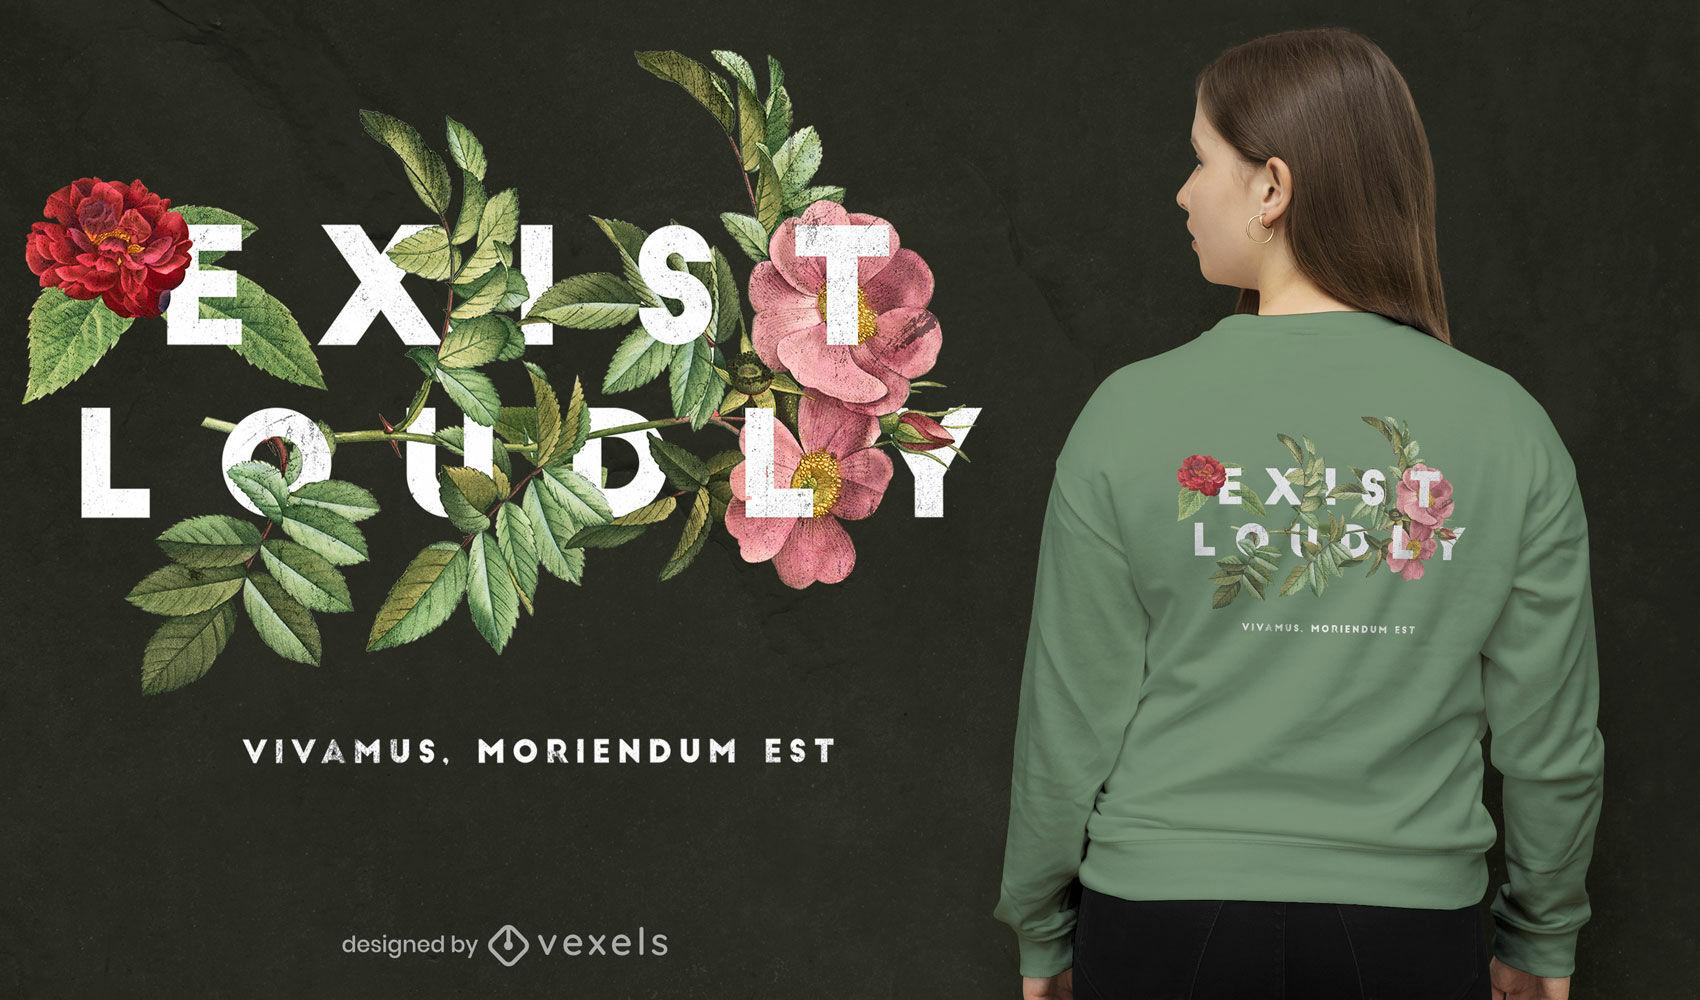 Diseño de camiseta psd de flores en voz alta